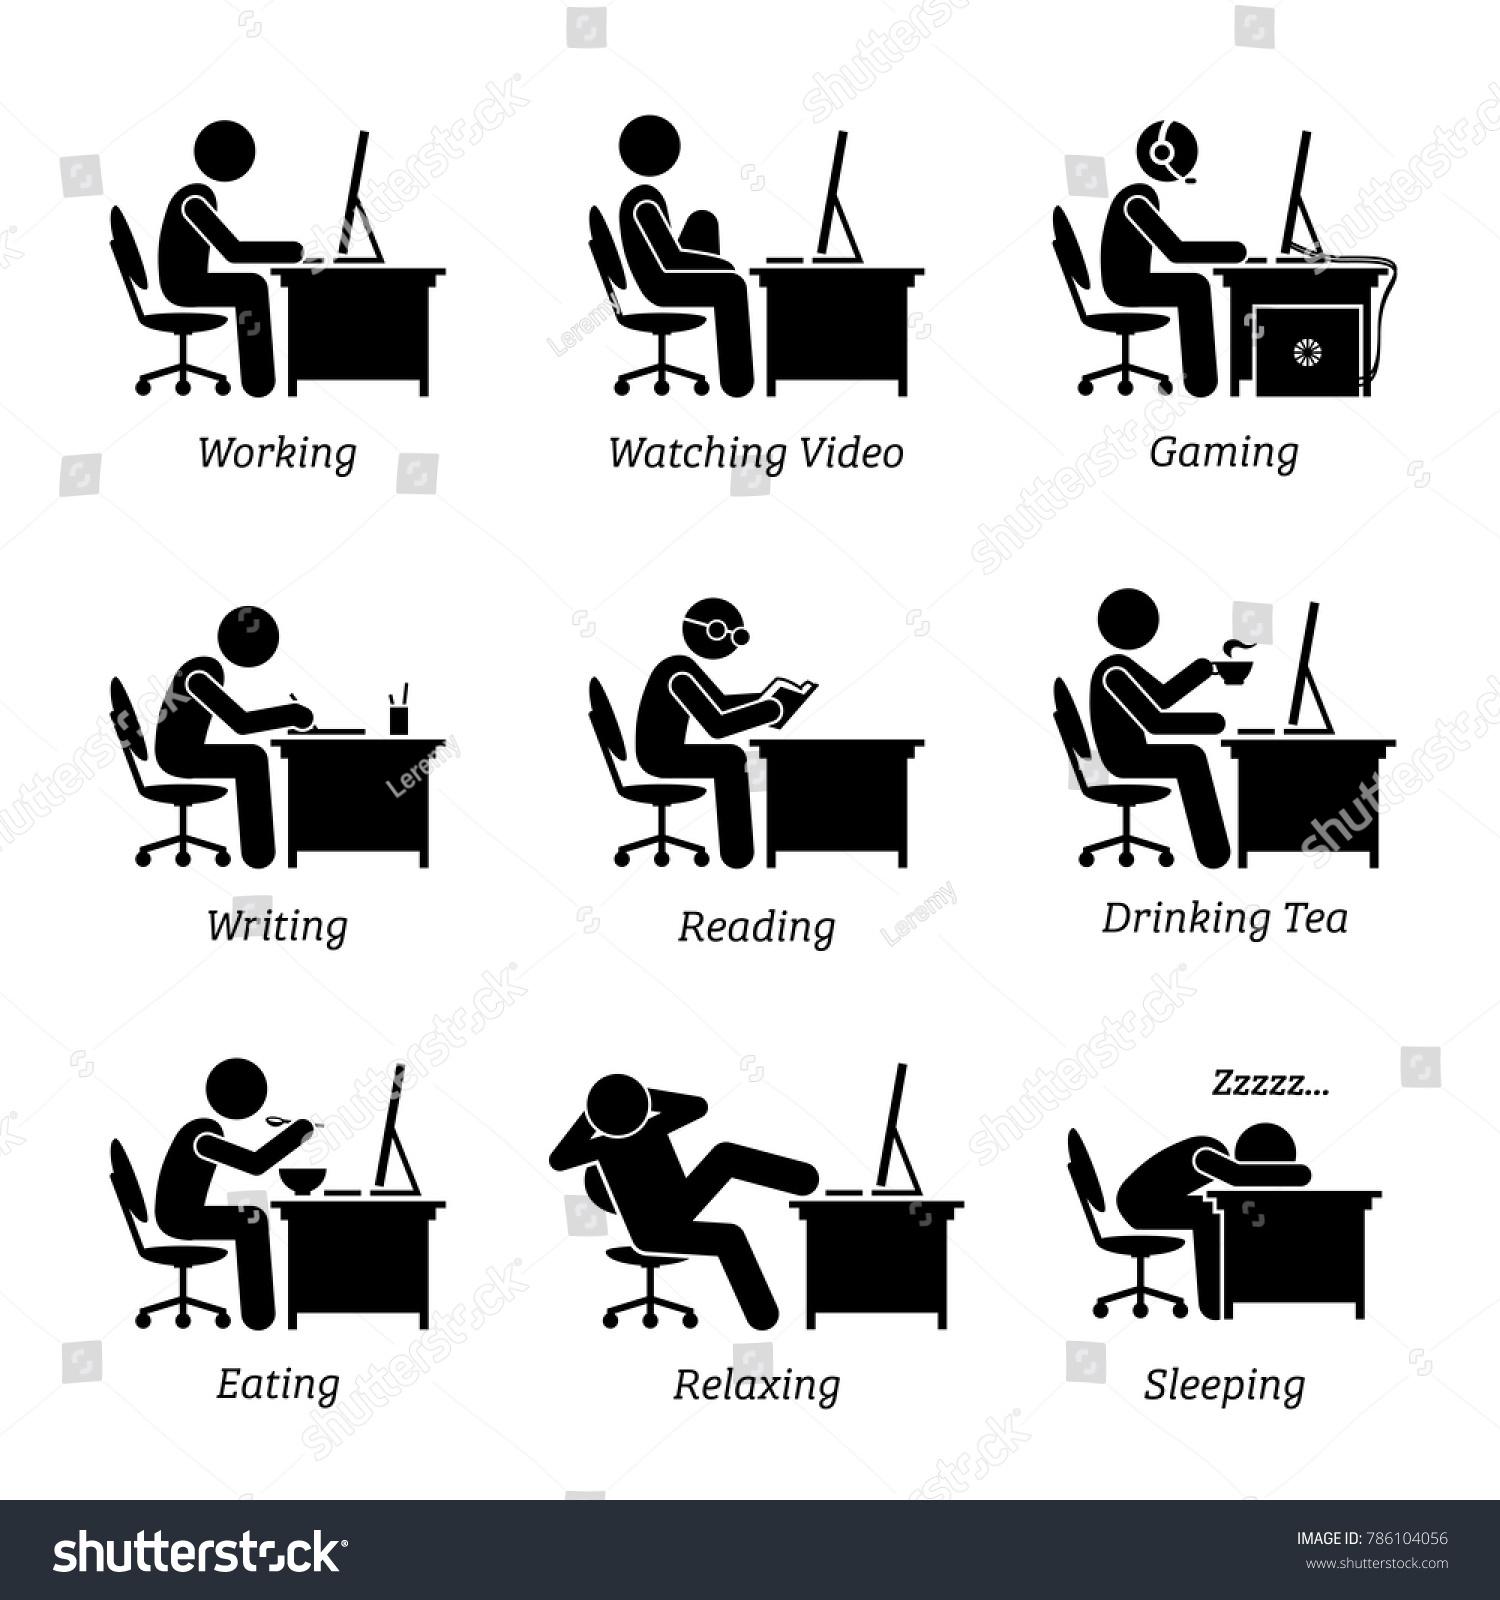 Executive Working Front Computer Office Workplace Stock-Vektorgrafik ...